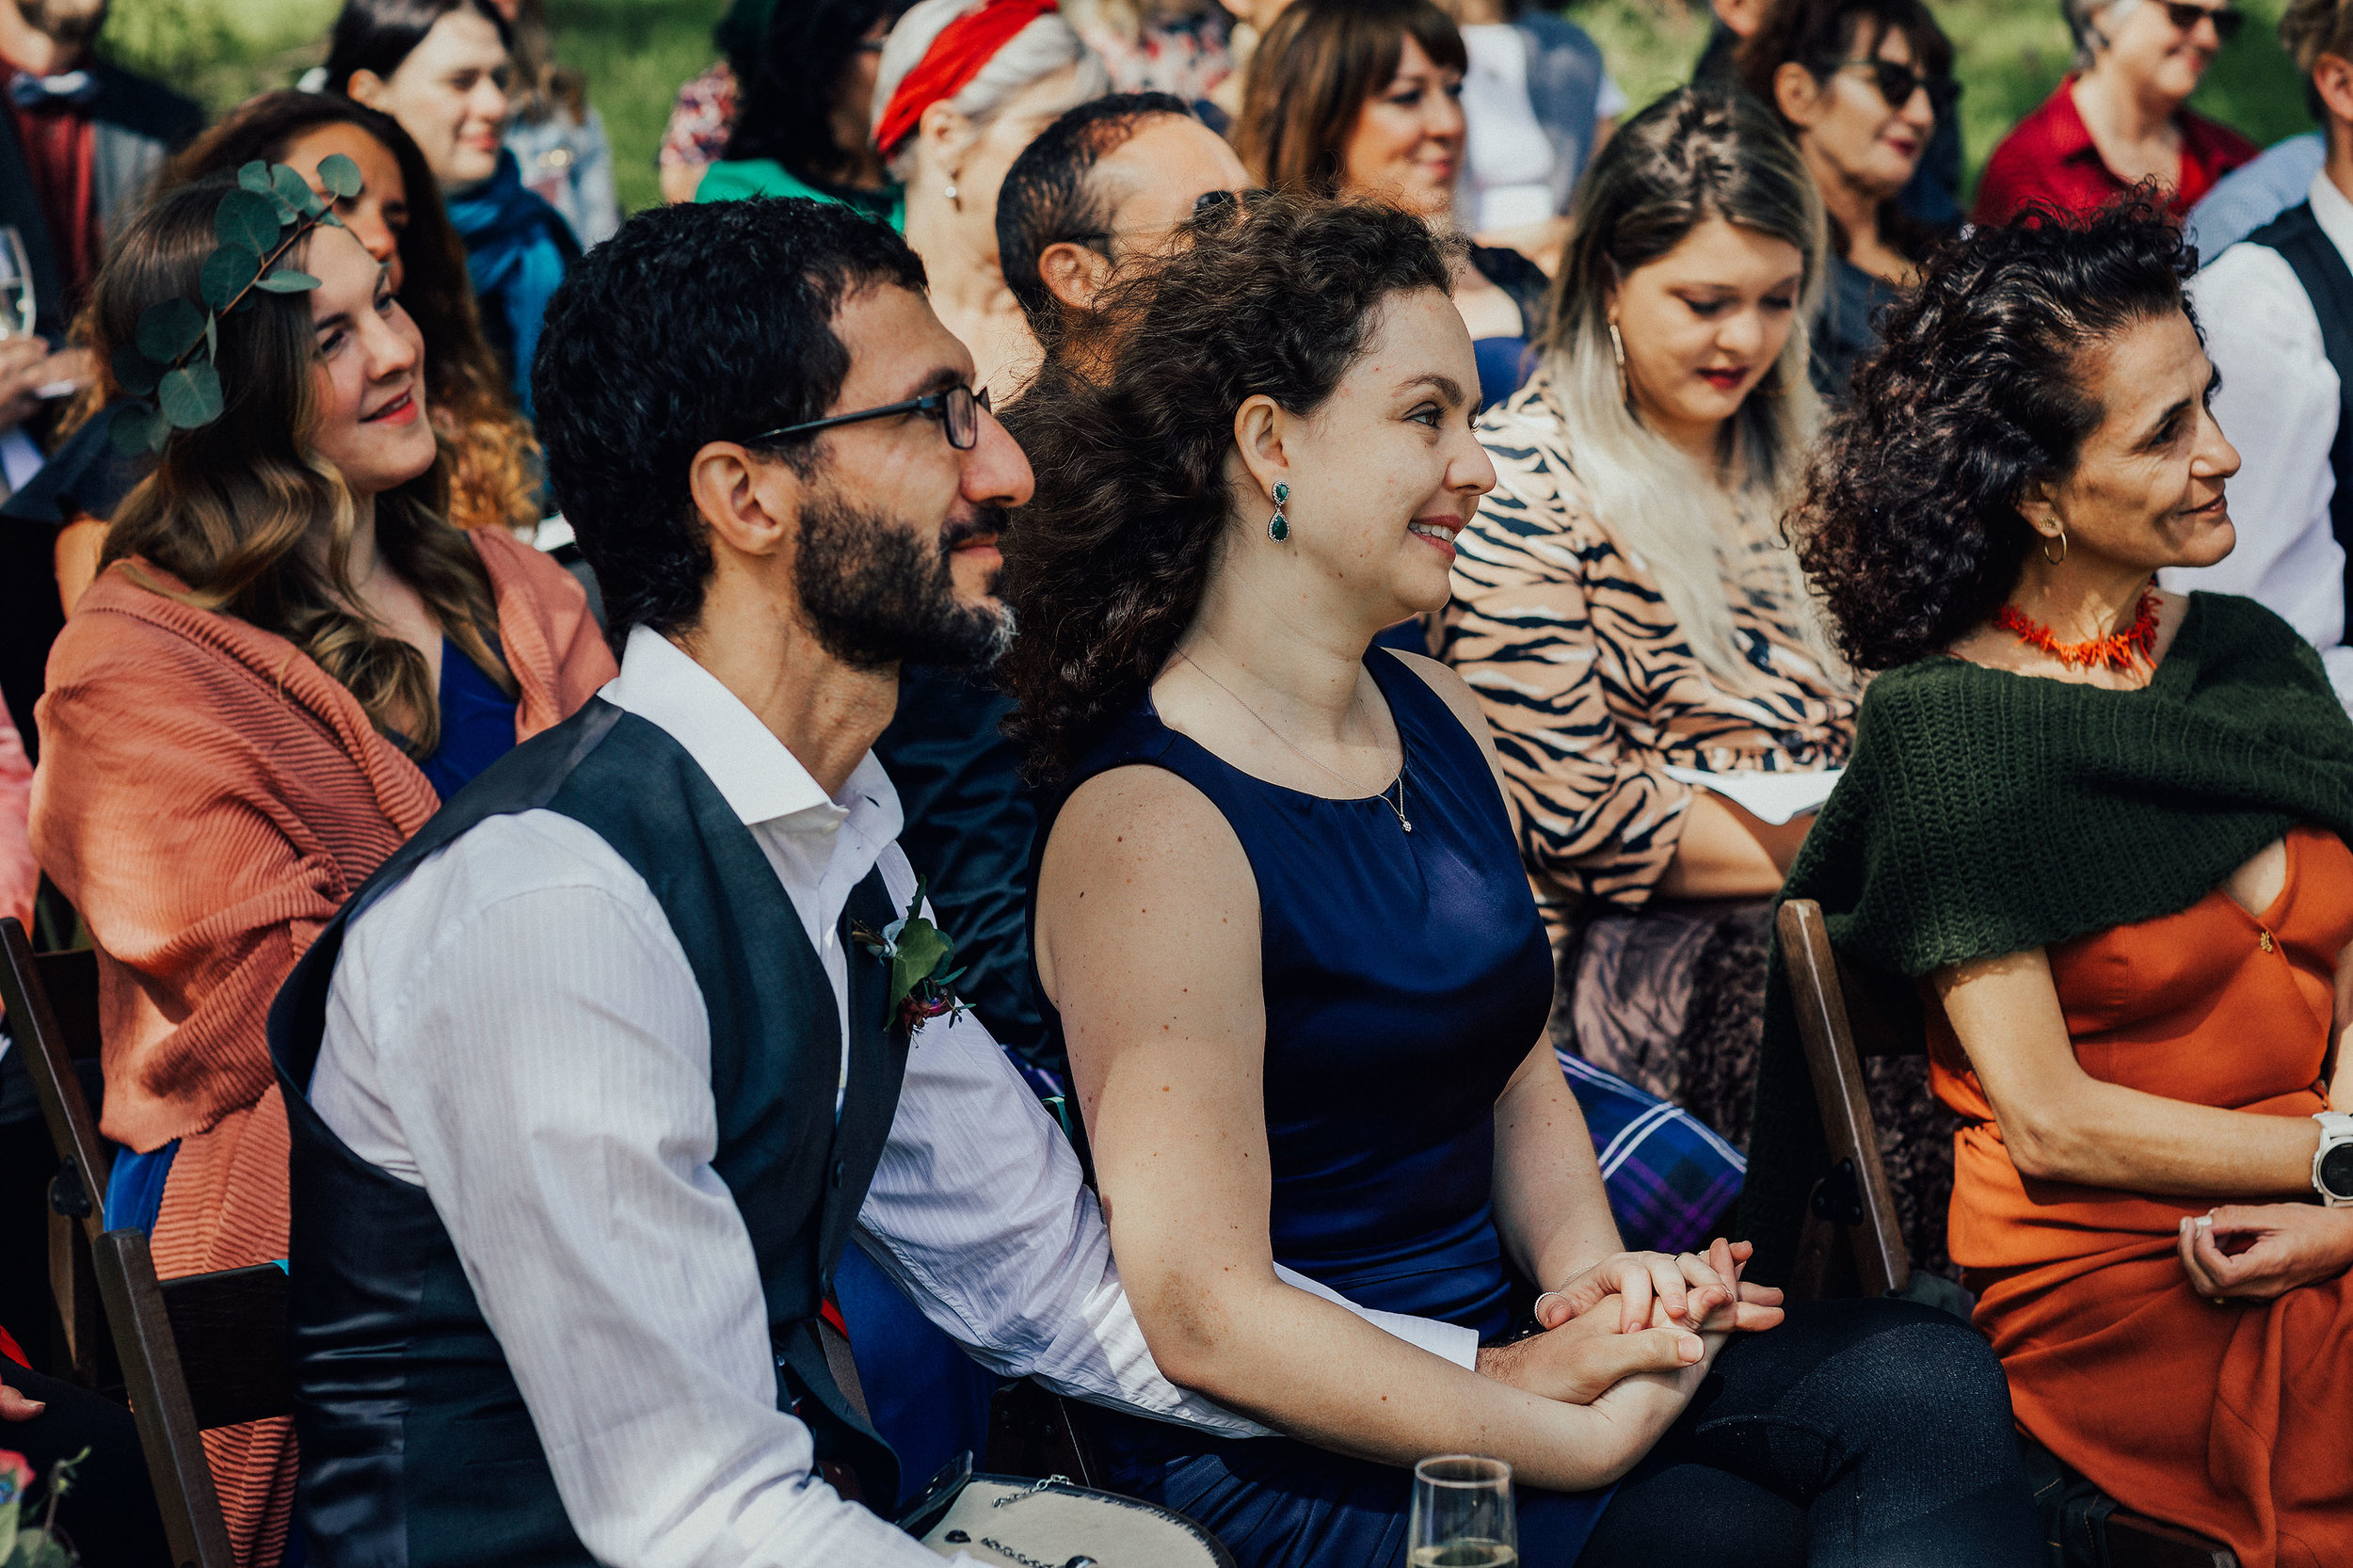 COMRIE_CROFT_WEDDINGS_PJ_PHILLIPS_PHOTOGRAPHY_78.jpg